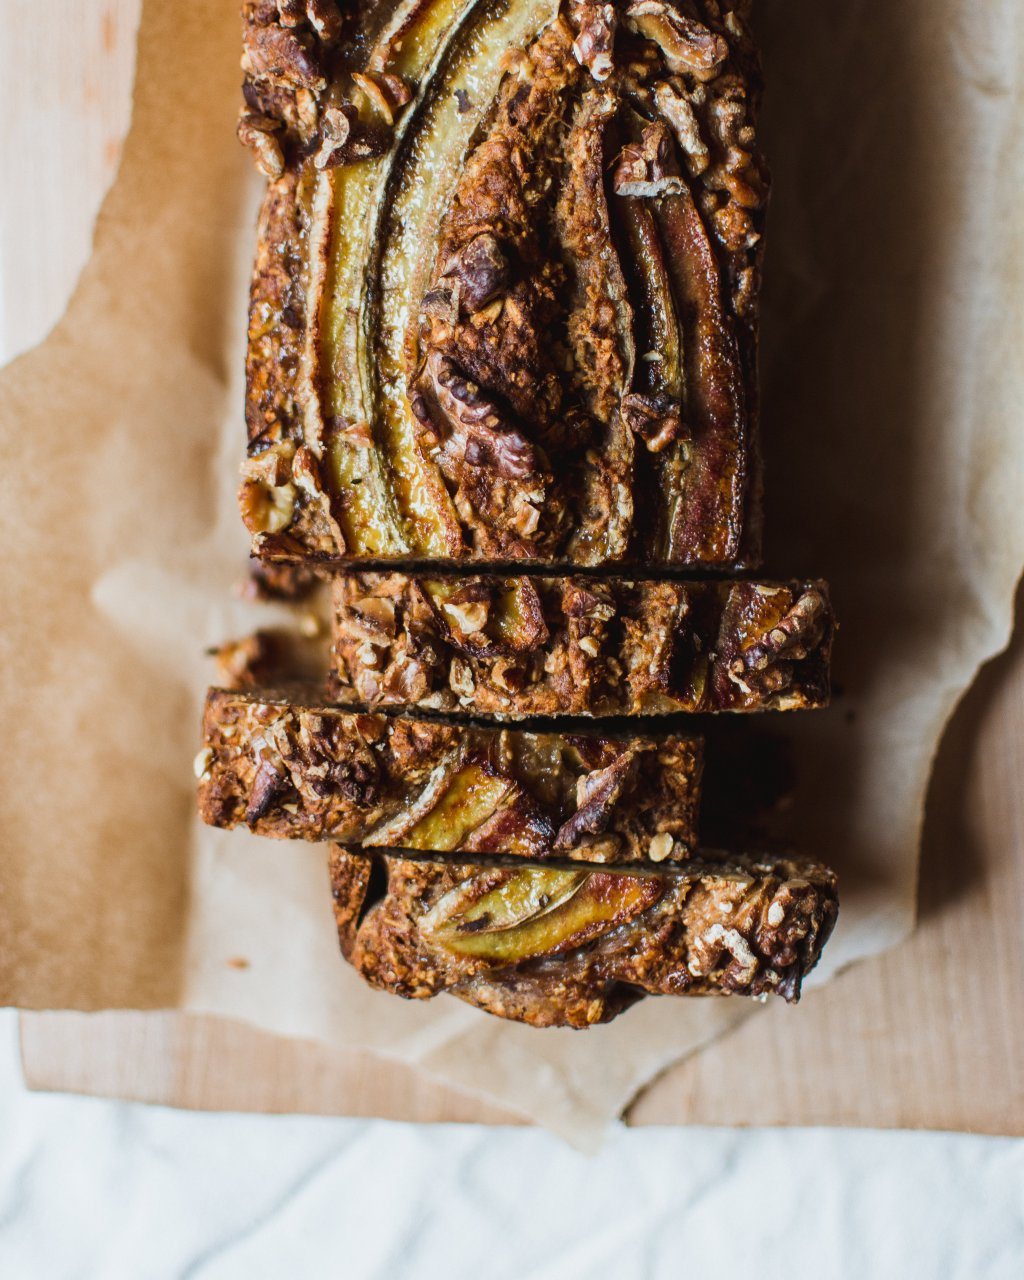 Foto van bananenbrood